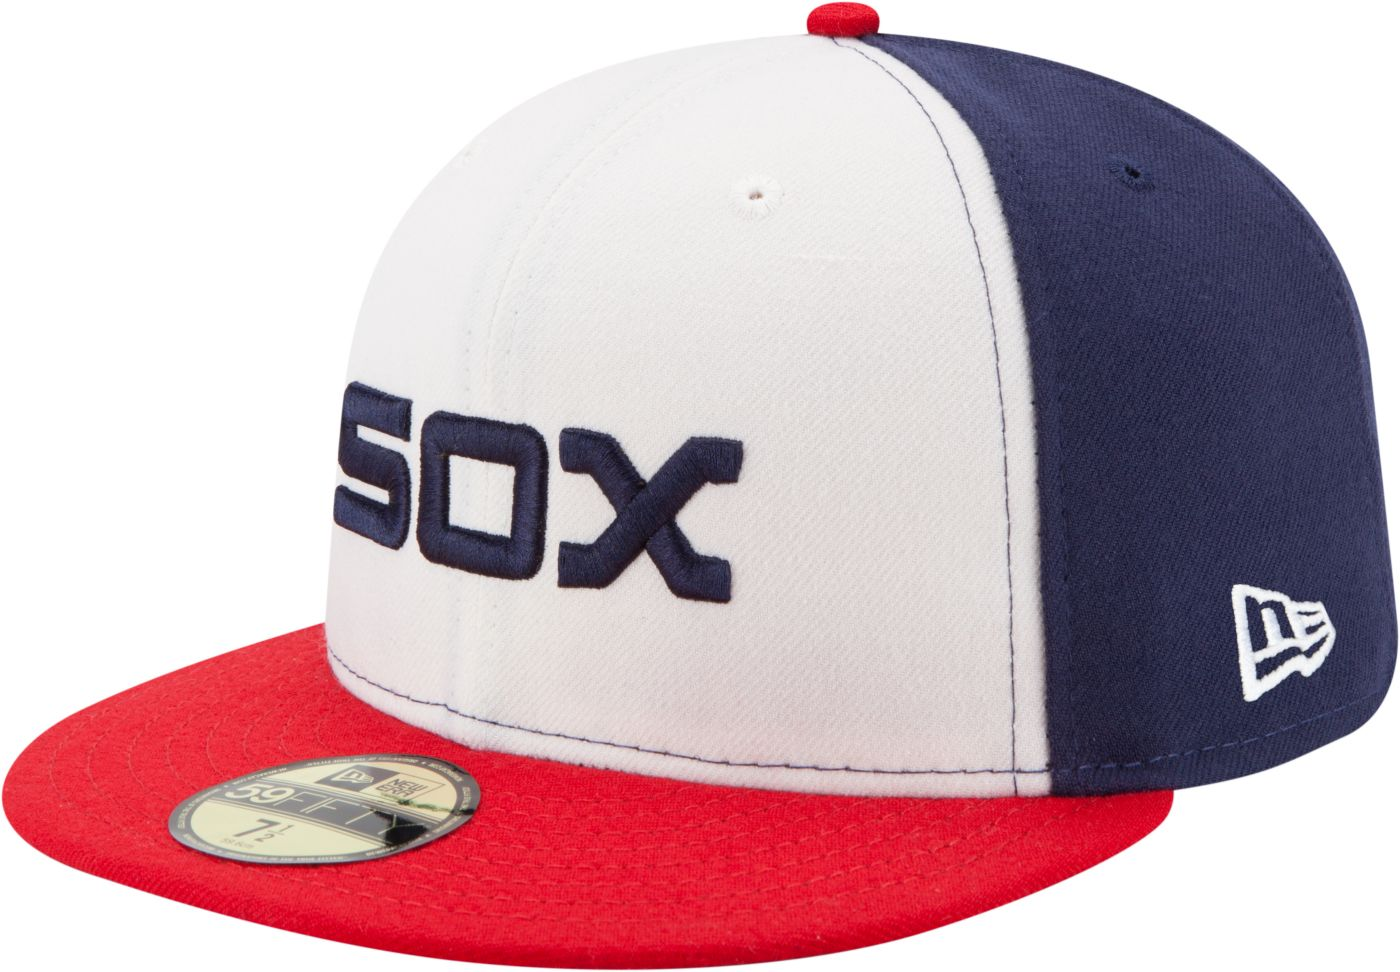 New Era Men's Chicago White Sox 59Fifty Alternate White/Navy Authentic Hat